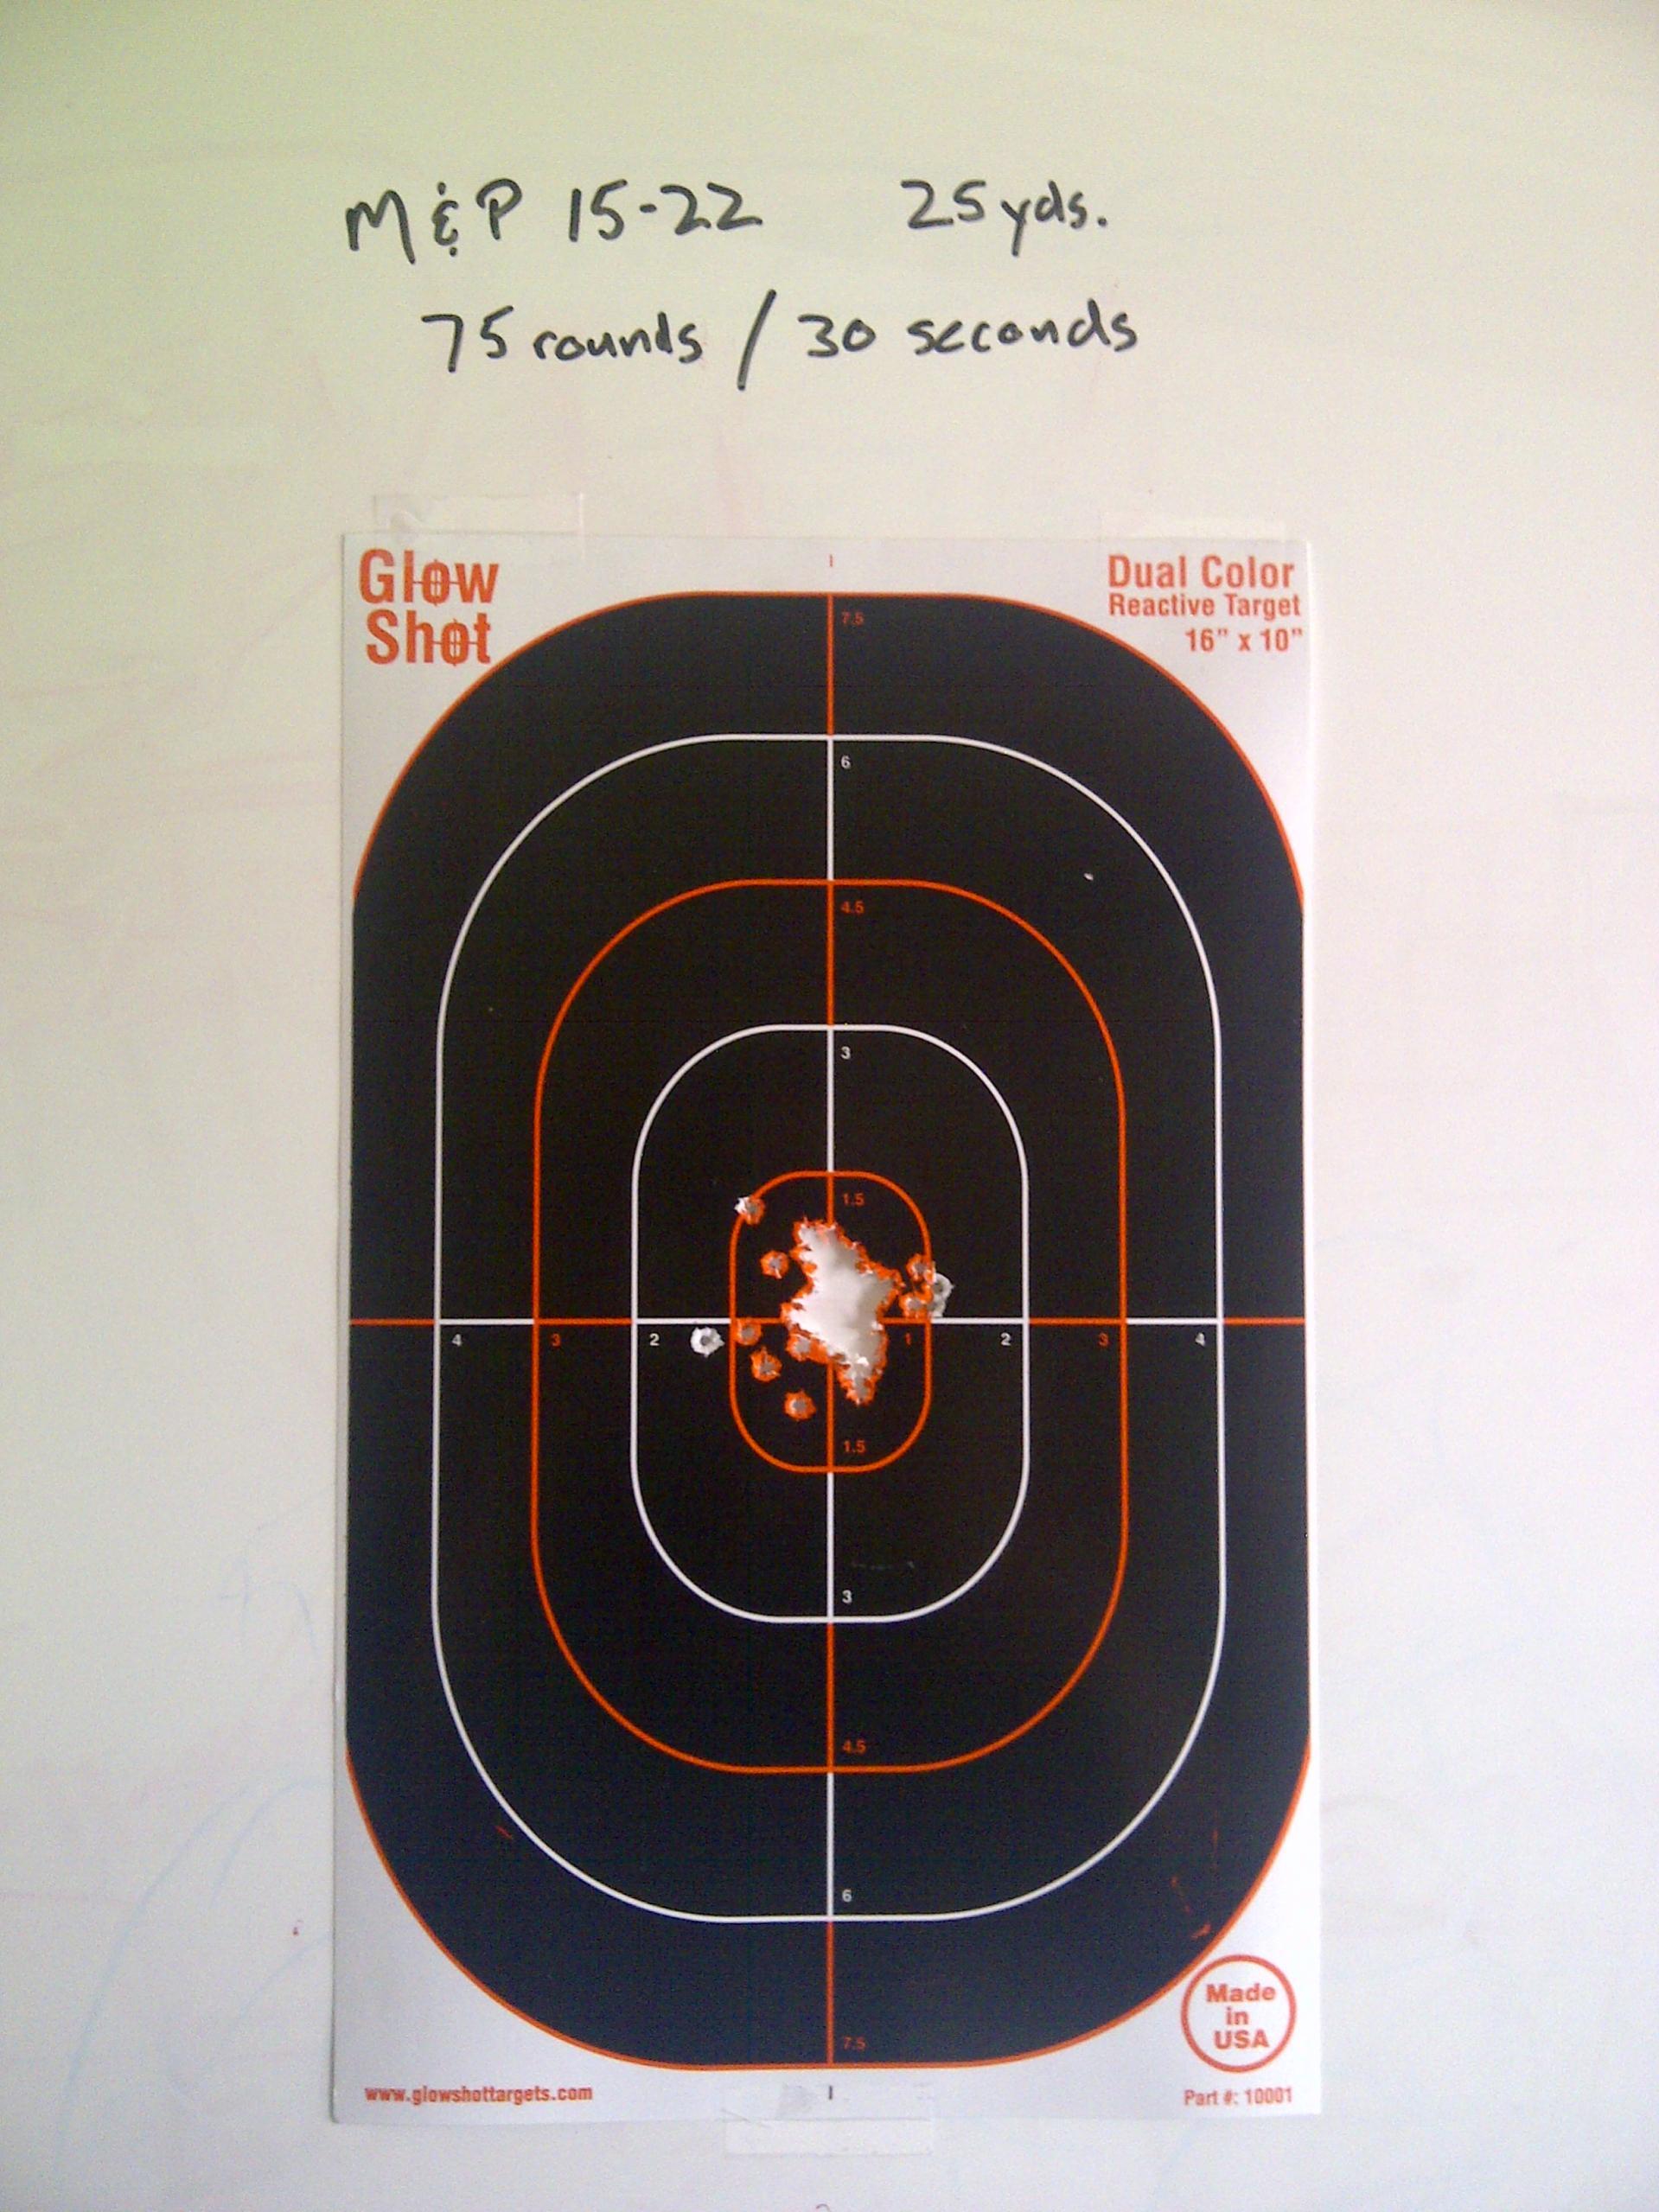 What is reasonable gun control...-75rds25yds30secs.jpg